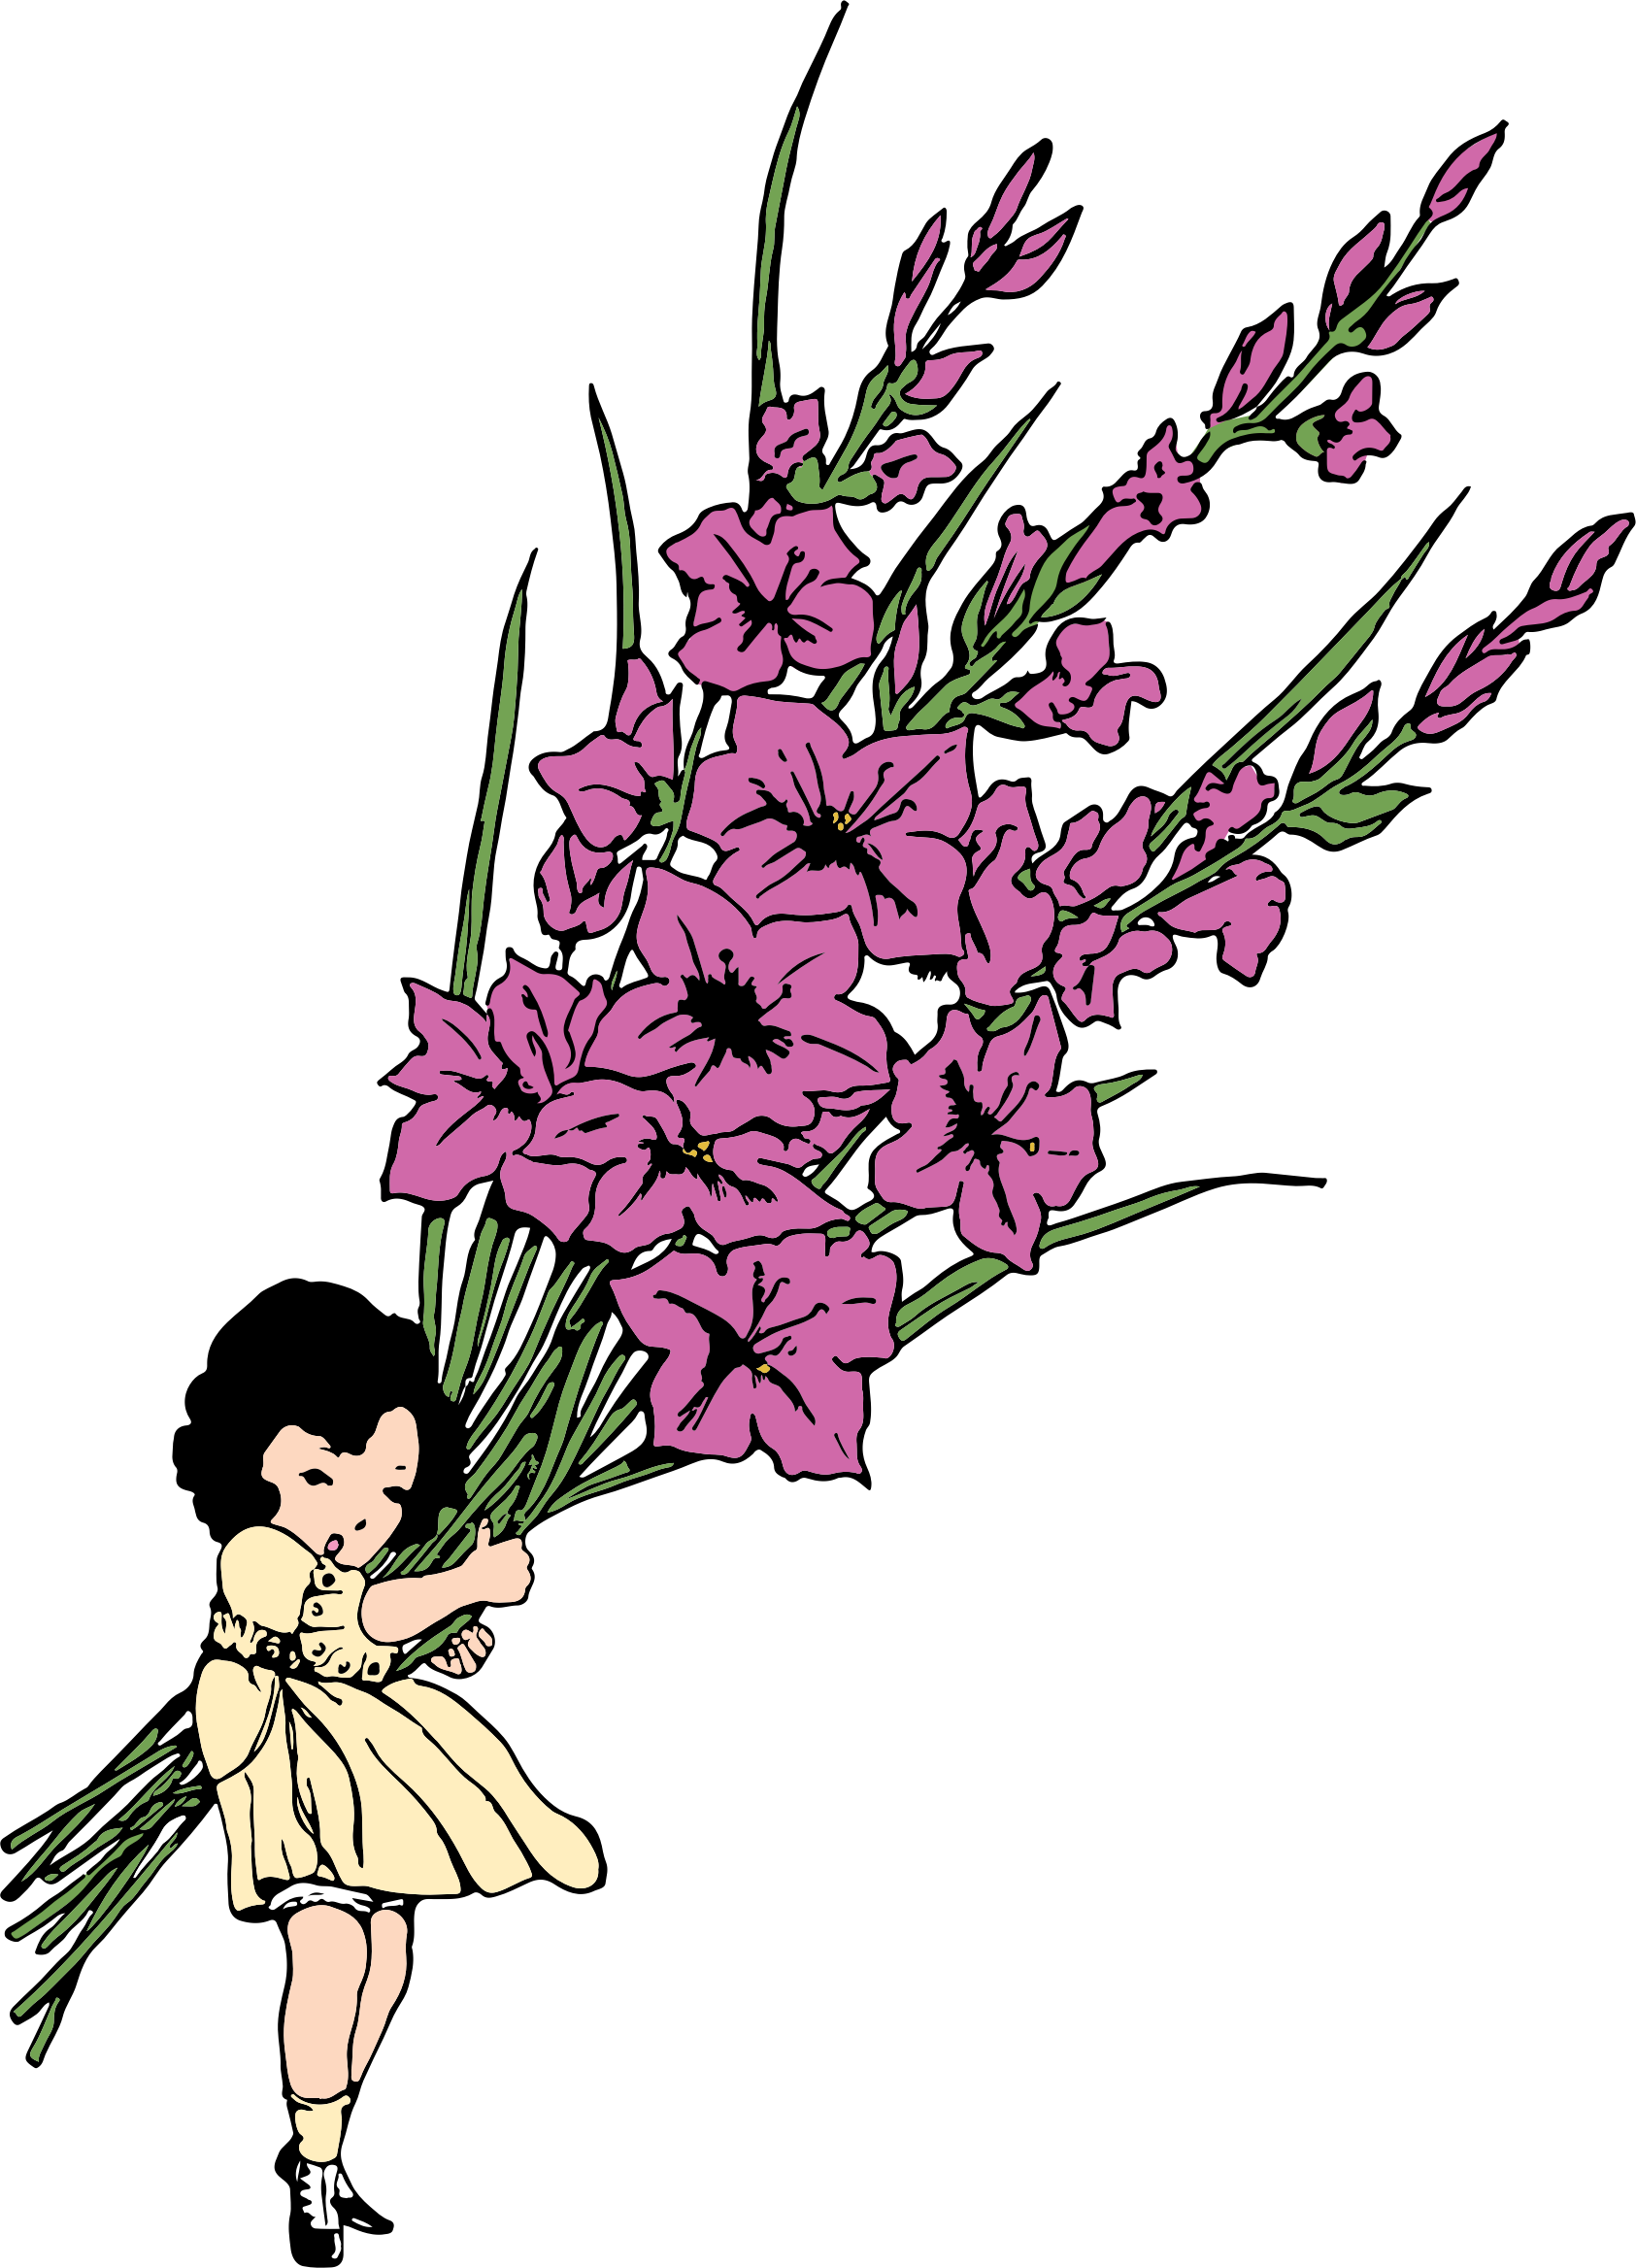 Girl big image png. Clipart flower child